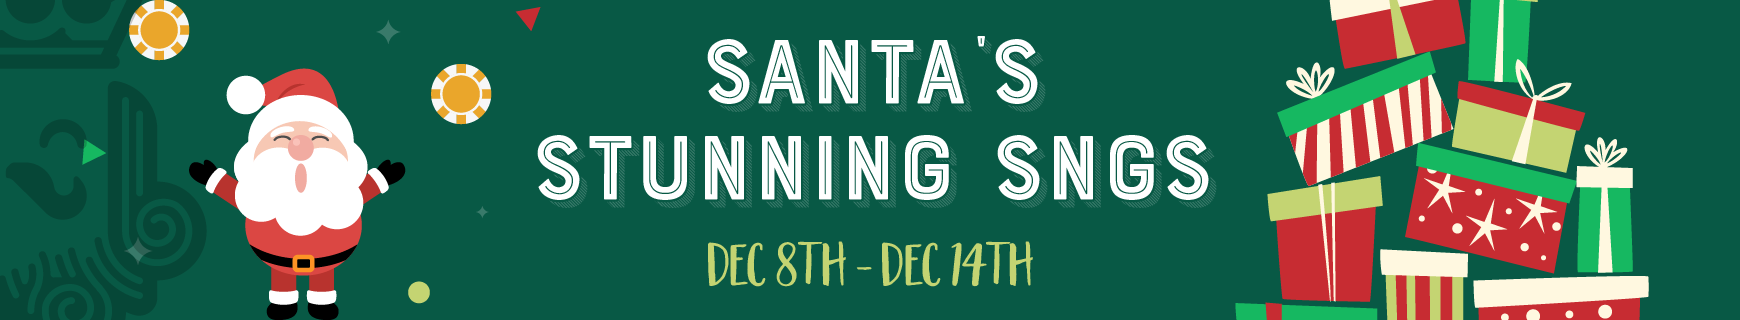 Santa's stunning sngs %28870 x 160%29 2x